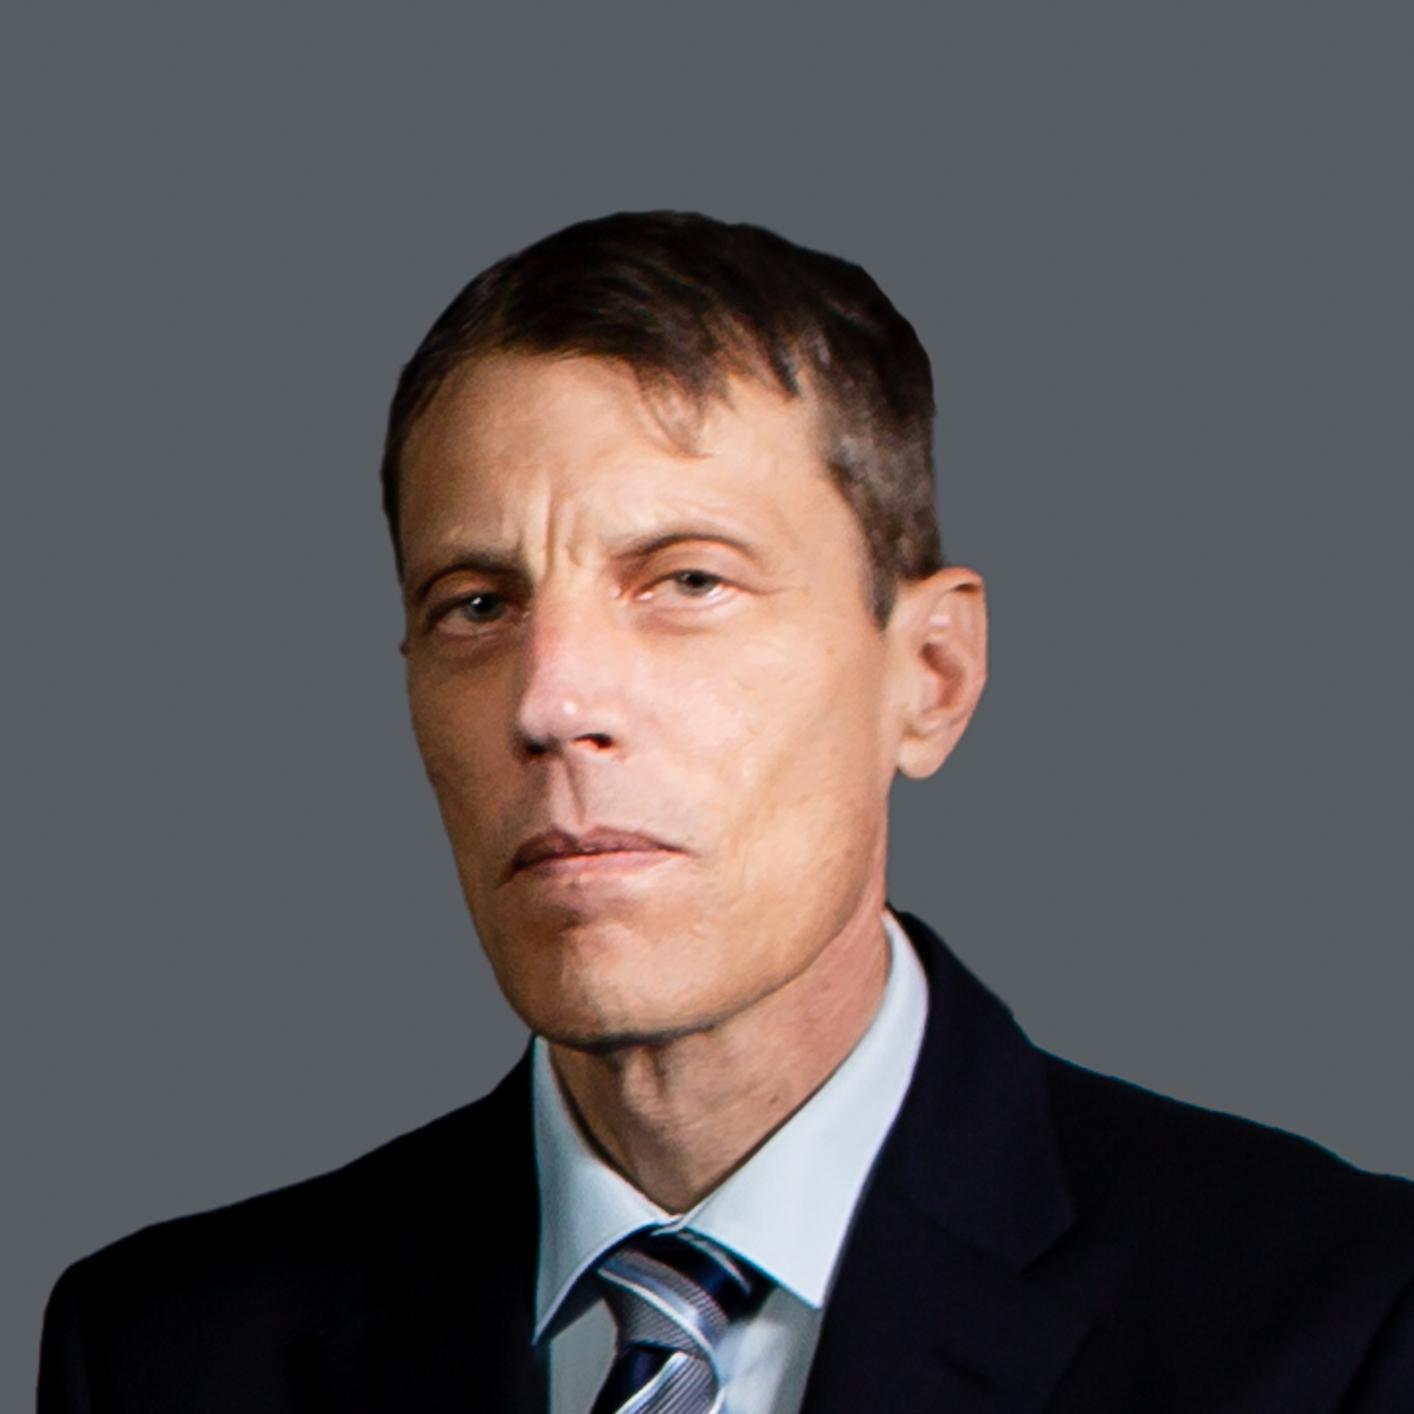 Attorney Adam D. Fein